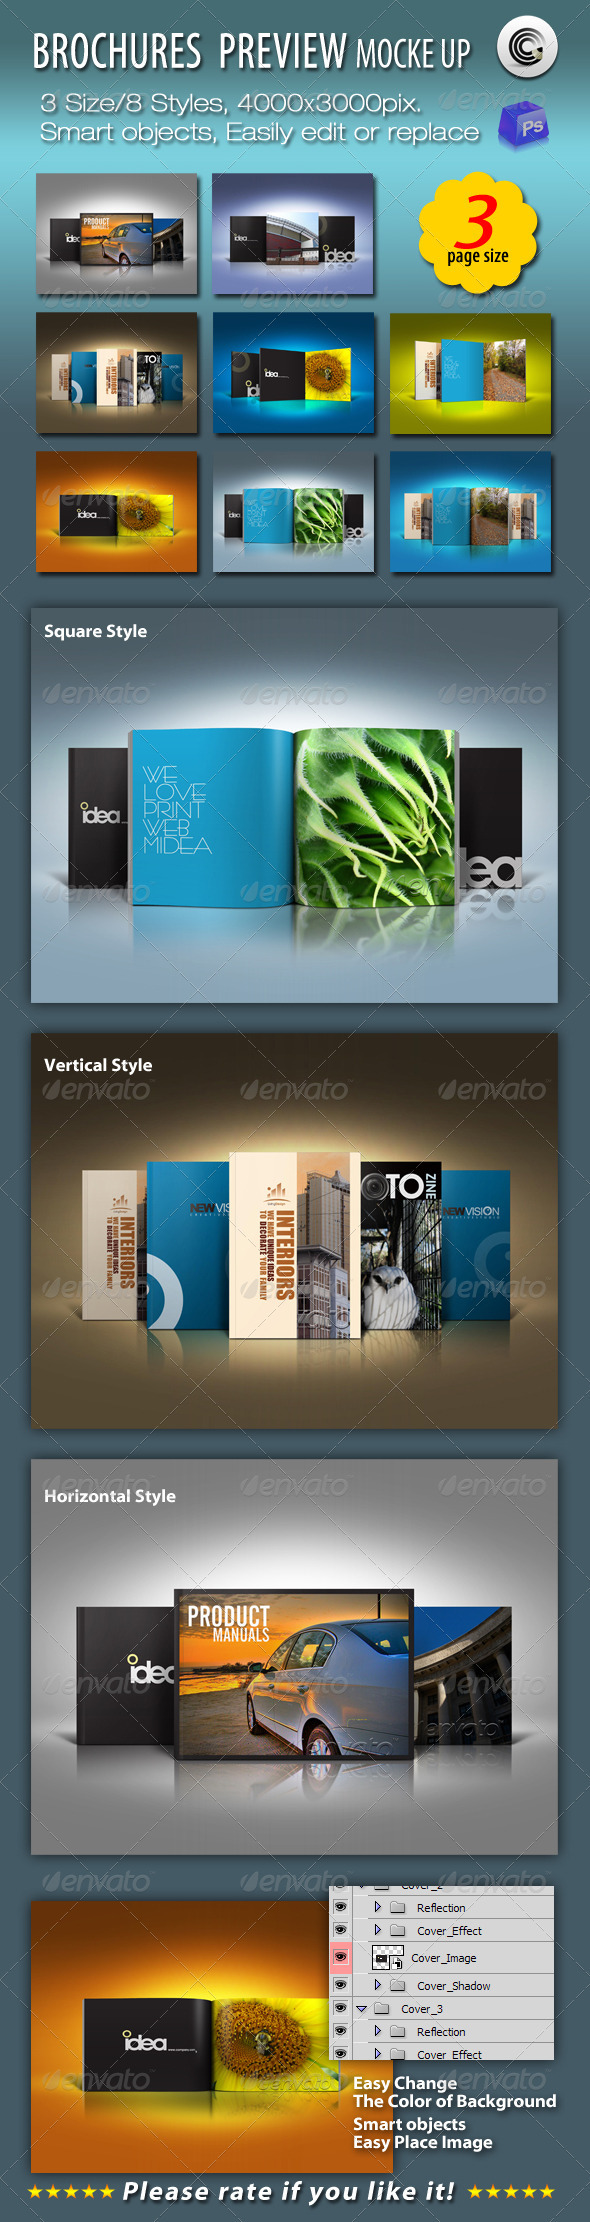 GraphicRiver 3 Size Brochures Mock-up 663575